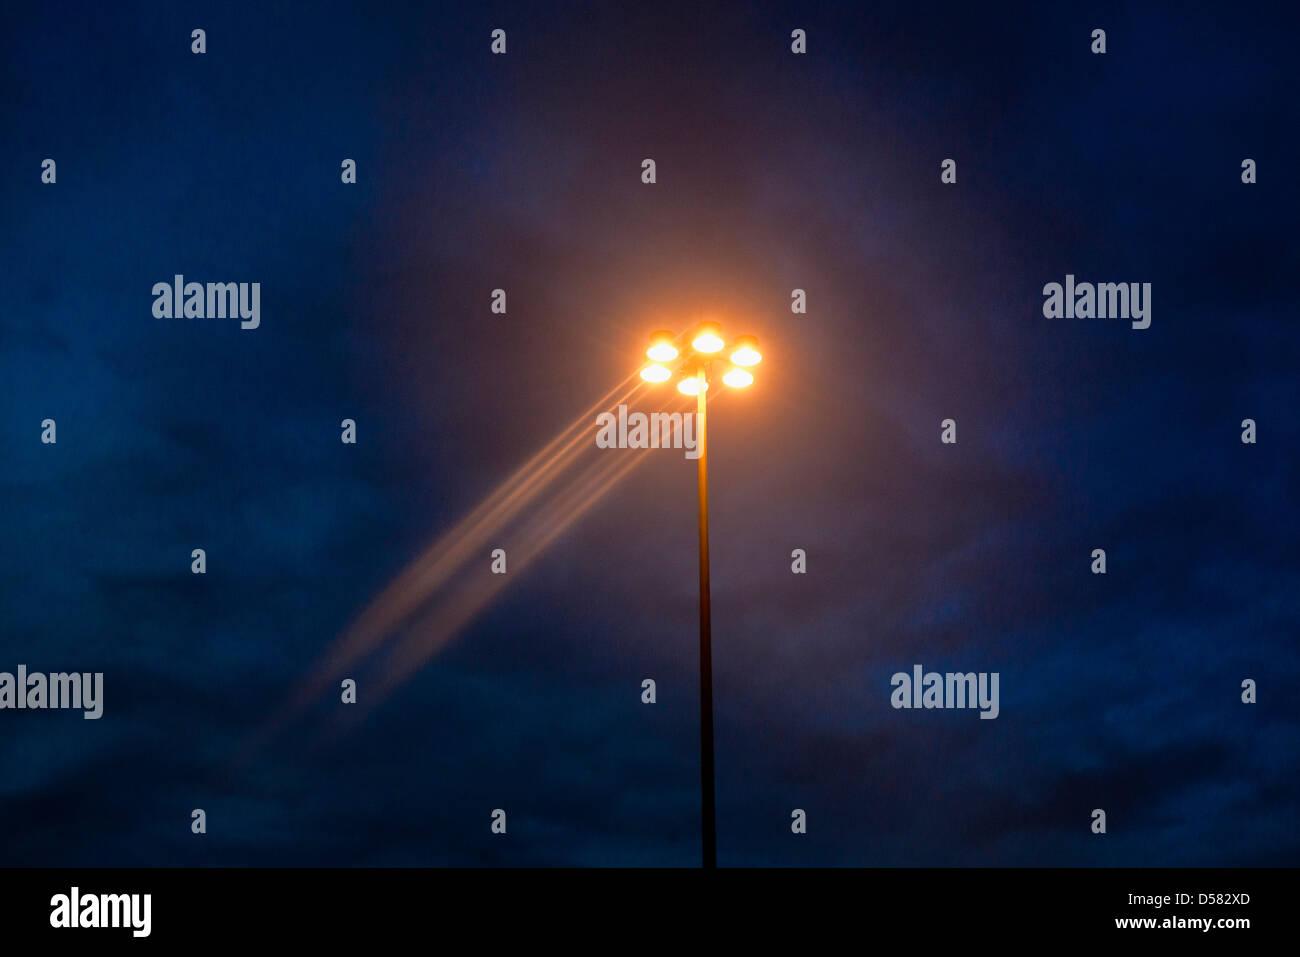 Street lamp at dusk. - Stock Image